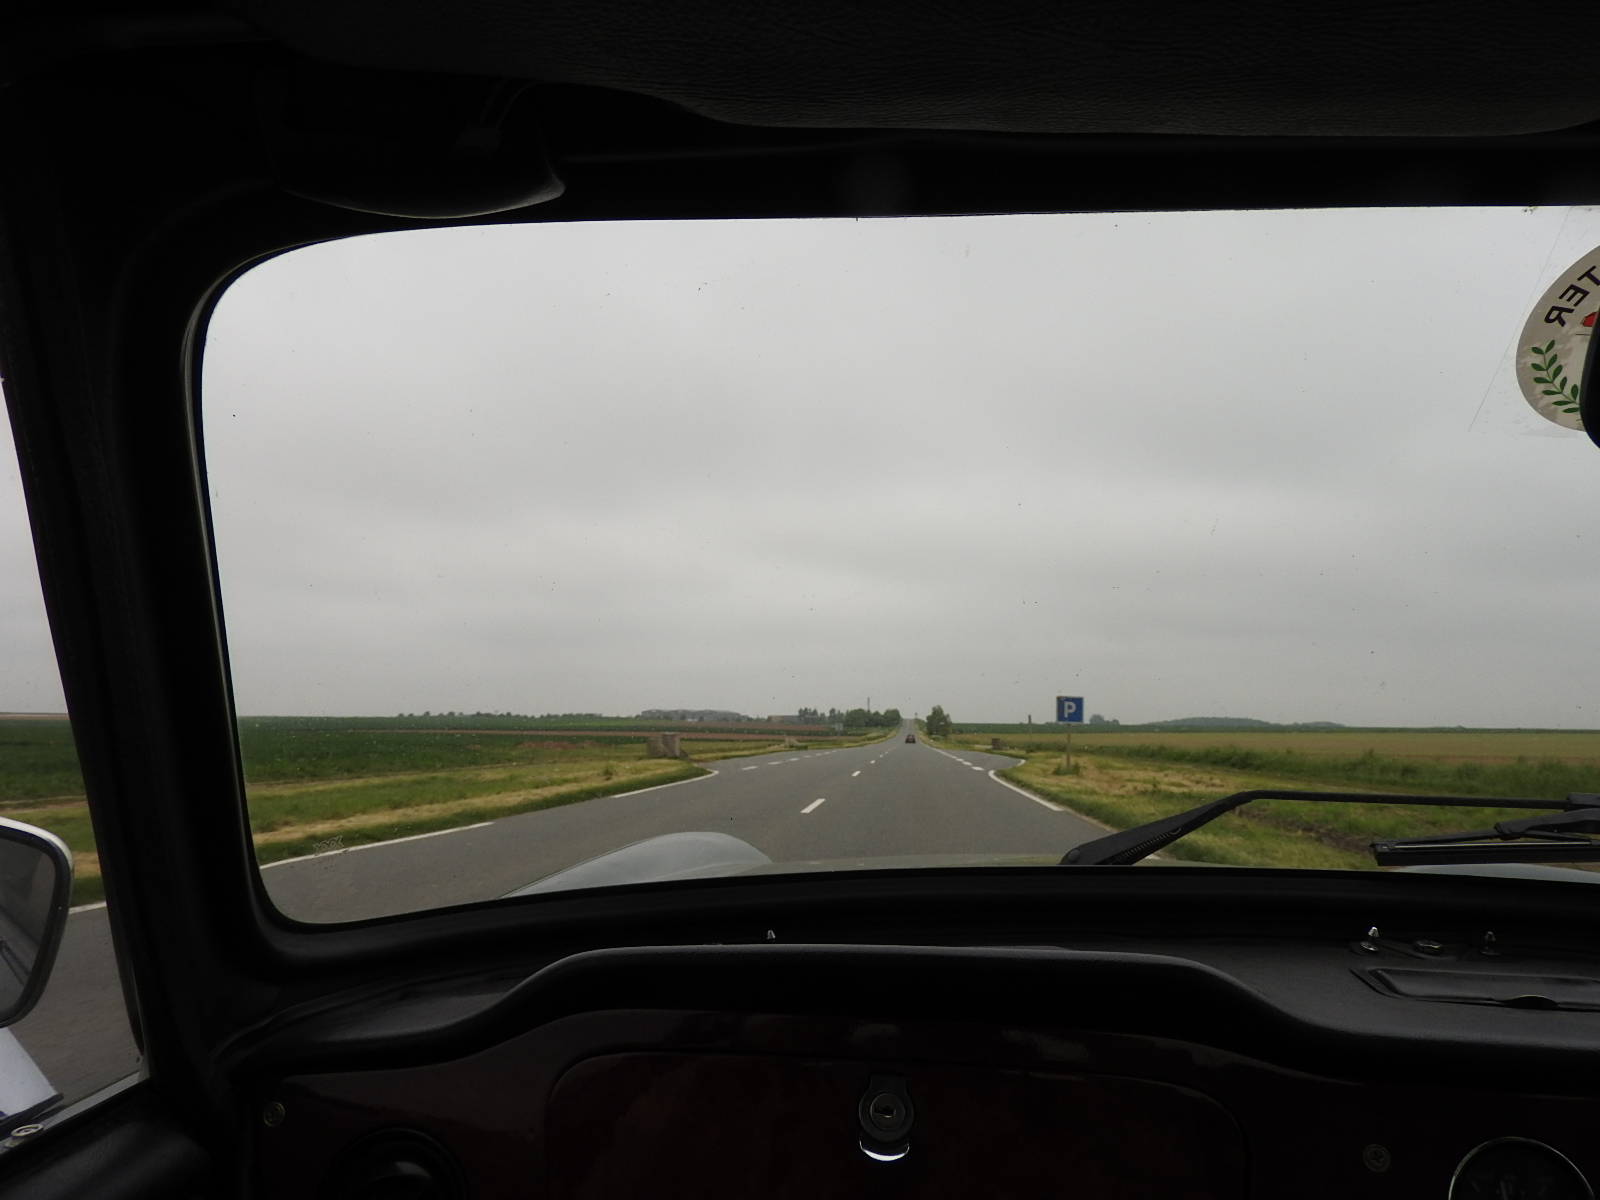 Hammering along long straight roads